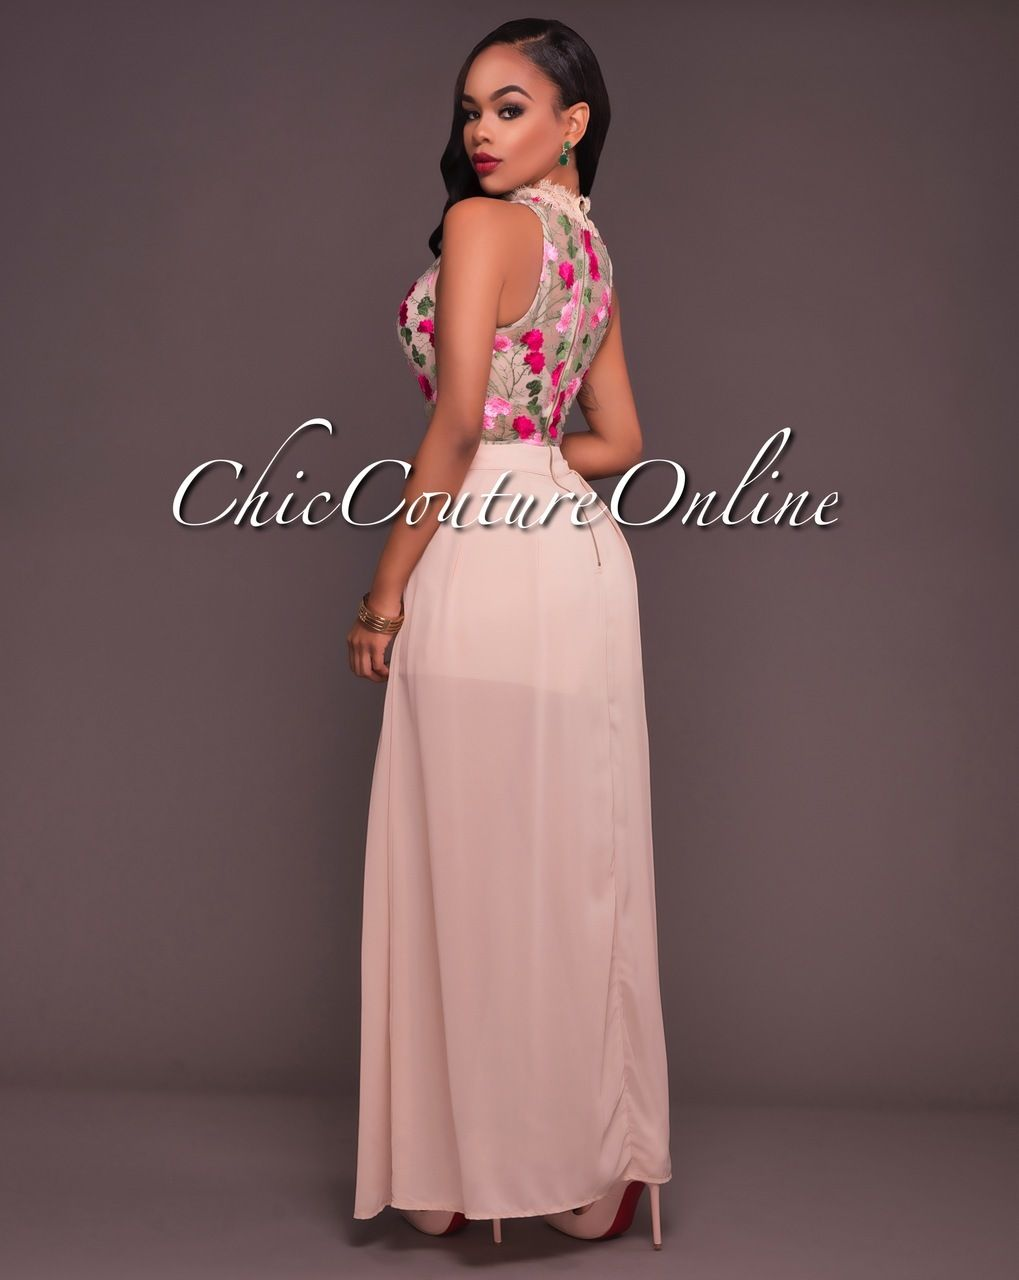 Sweet Escape Nude Sheer Top Romper Maxi Dress | Bellisima